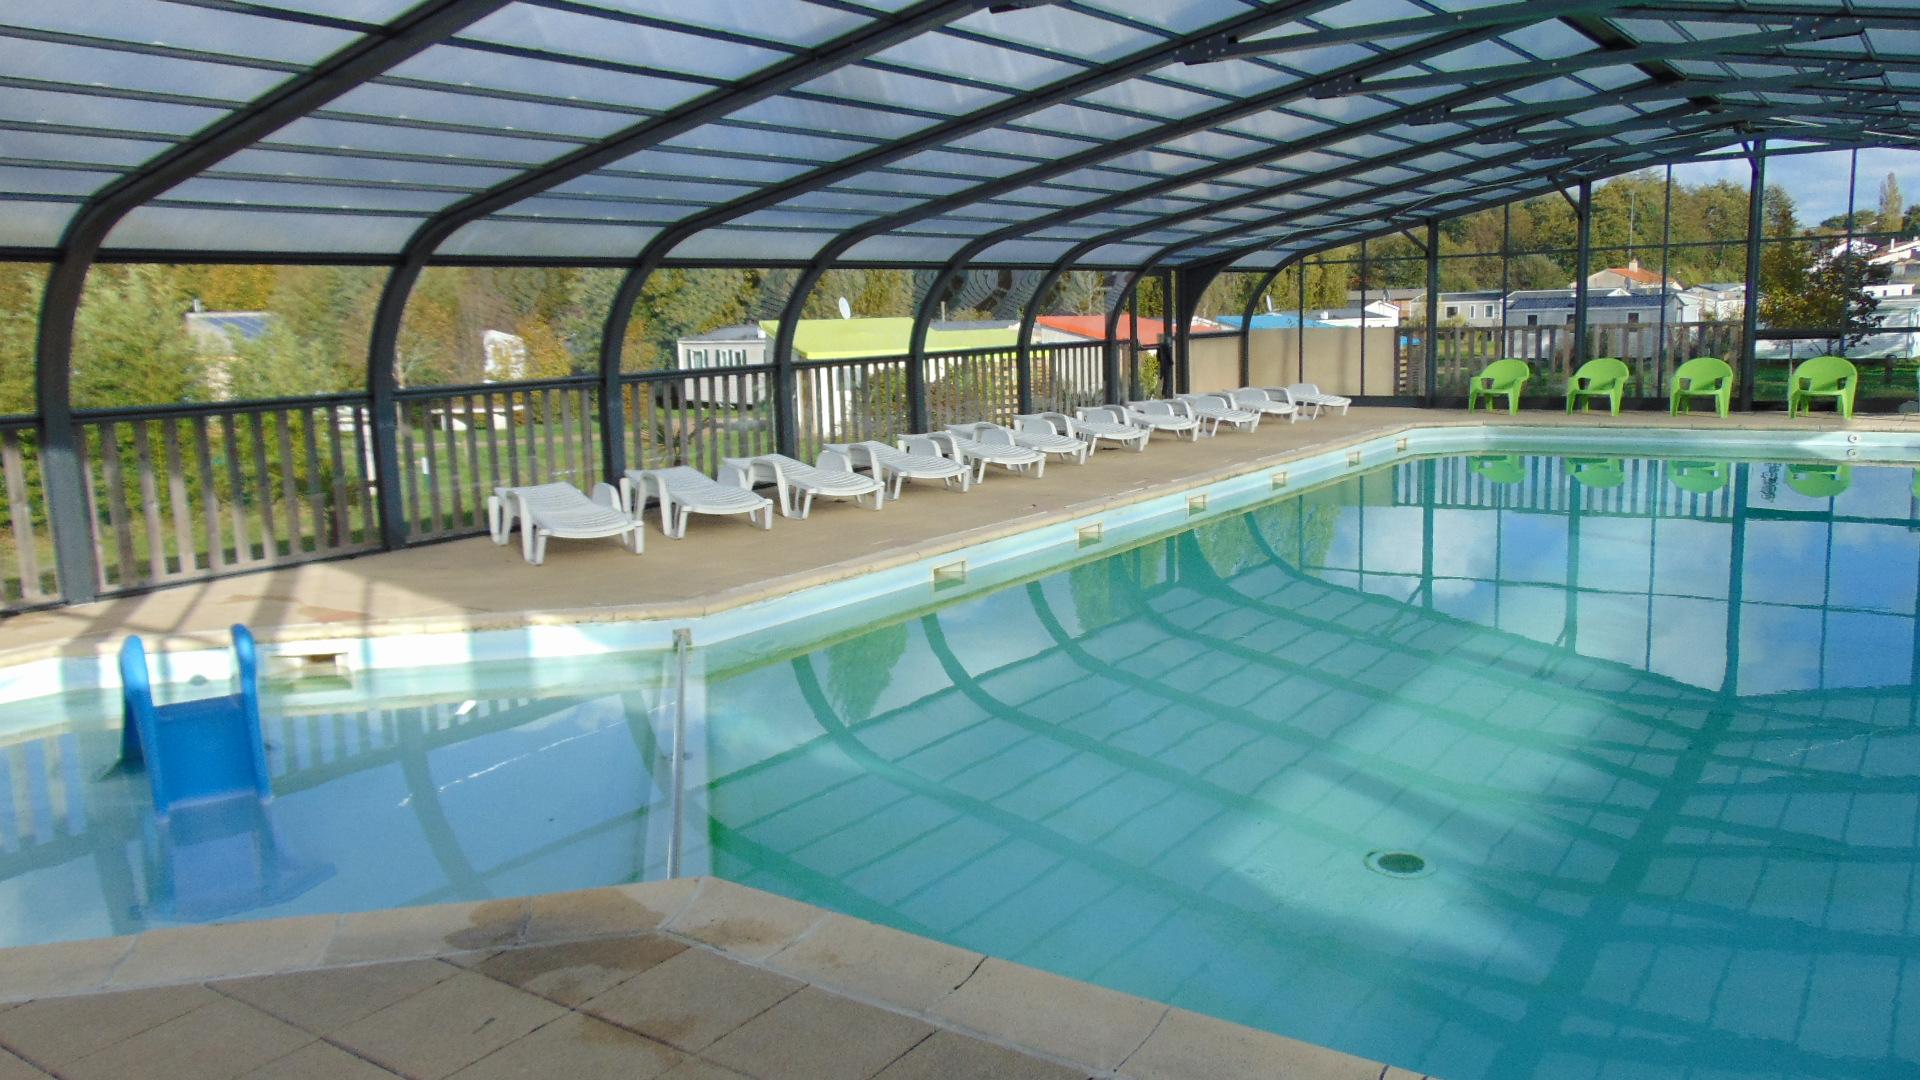 camping vend e avec piscine couverte